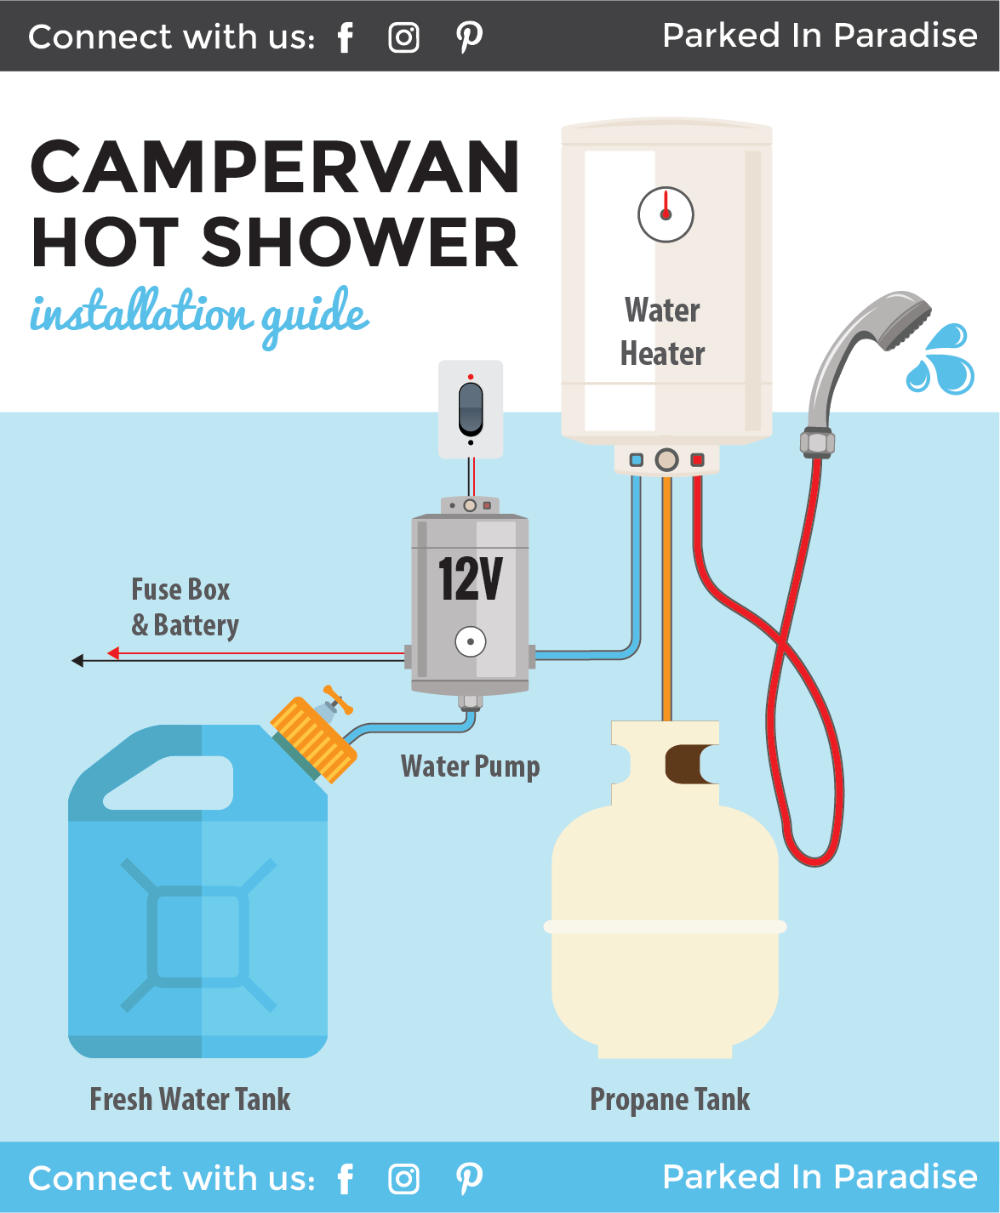 Installing A Portable 12v Water Heater In A Camper Van Van Life